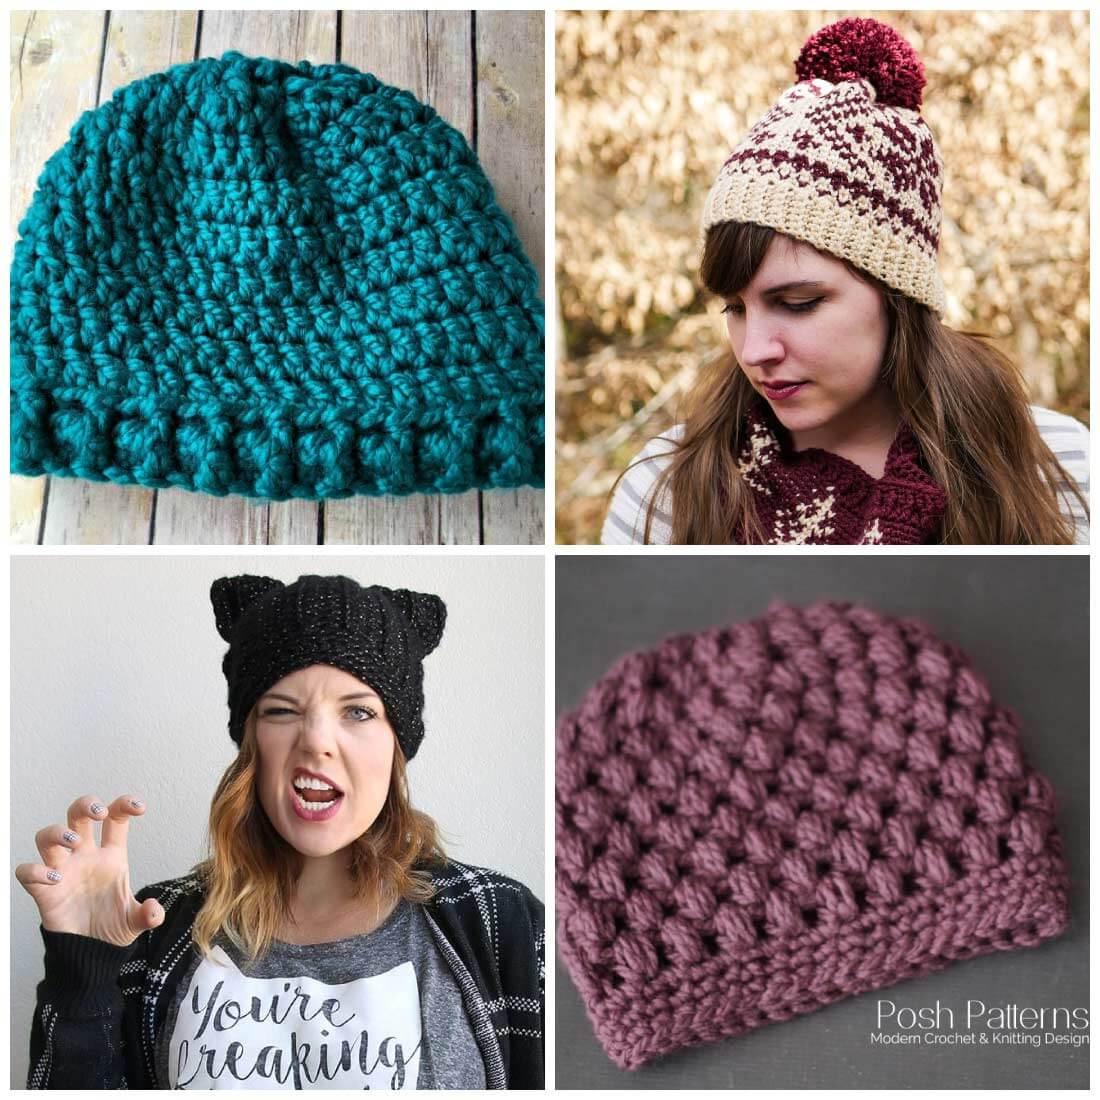 free crochet hat patterns   free crochet patterns   crochet patterns   use oudghsg